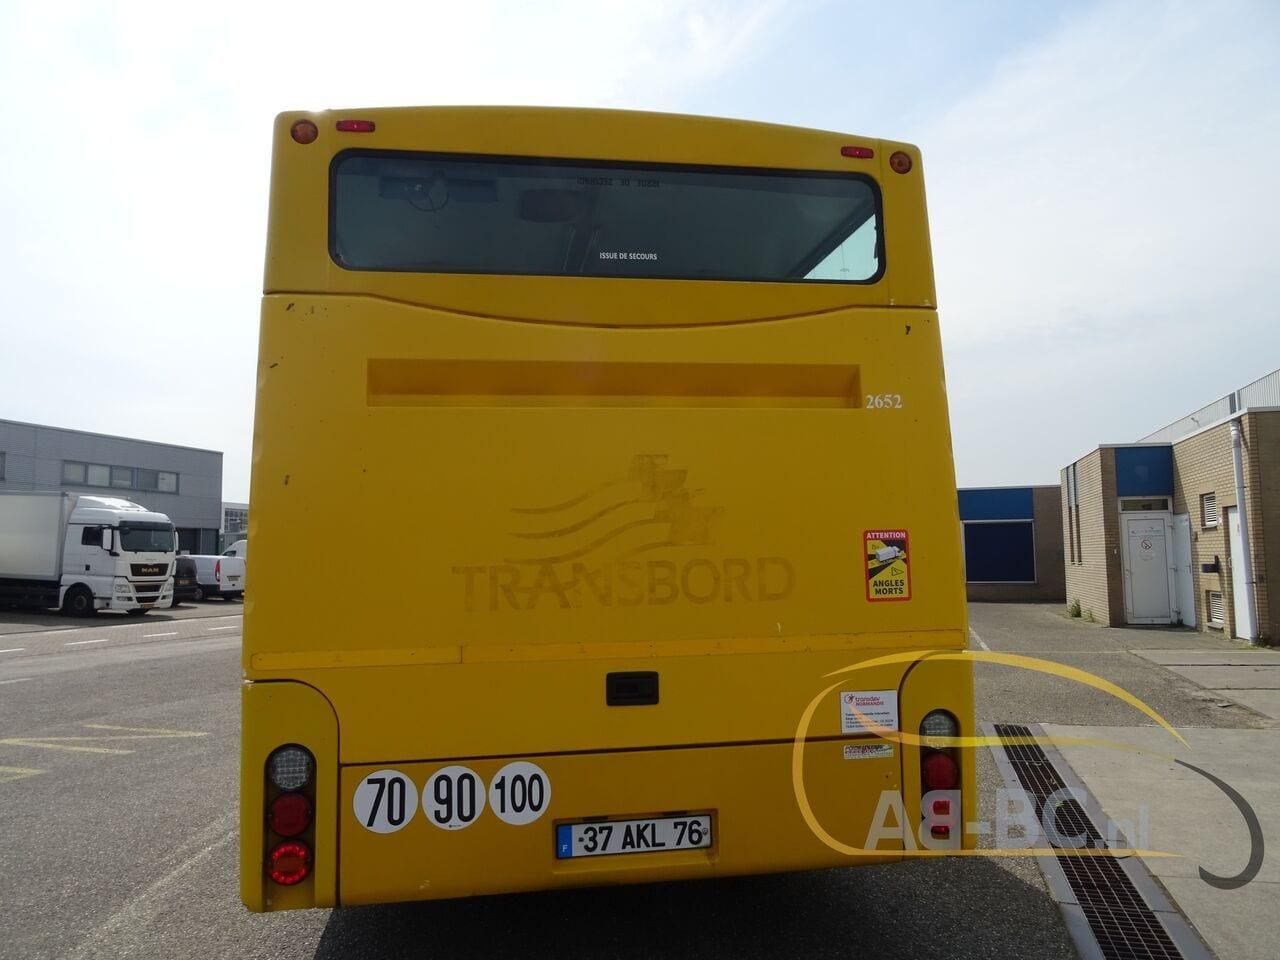 interurban-busMAN-Fast-64-seats---1619619737291192107_big_3f639cf84495e1e6213ece46d1dd6cc2--21042817163019598600